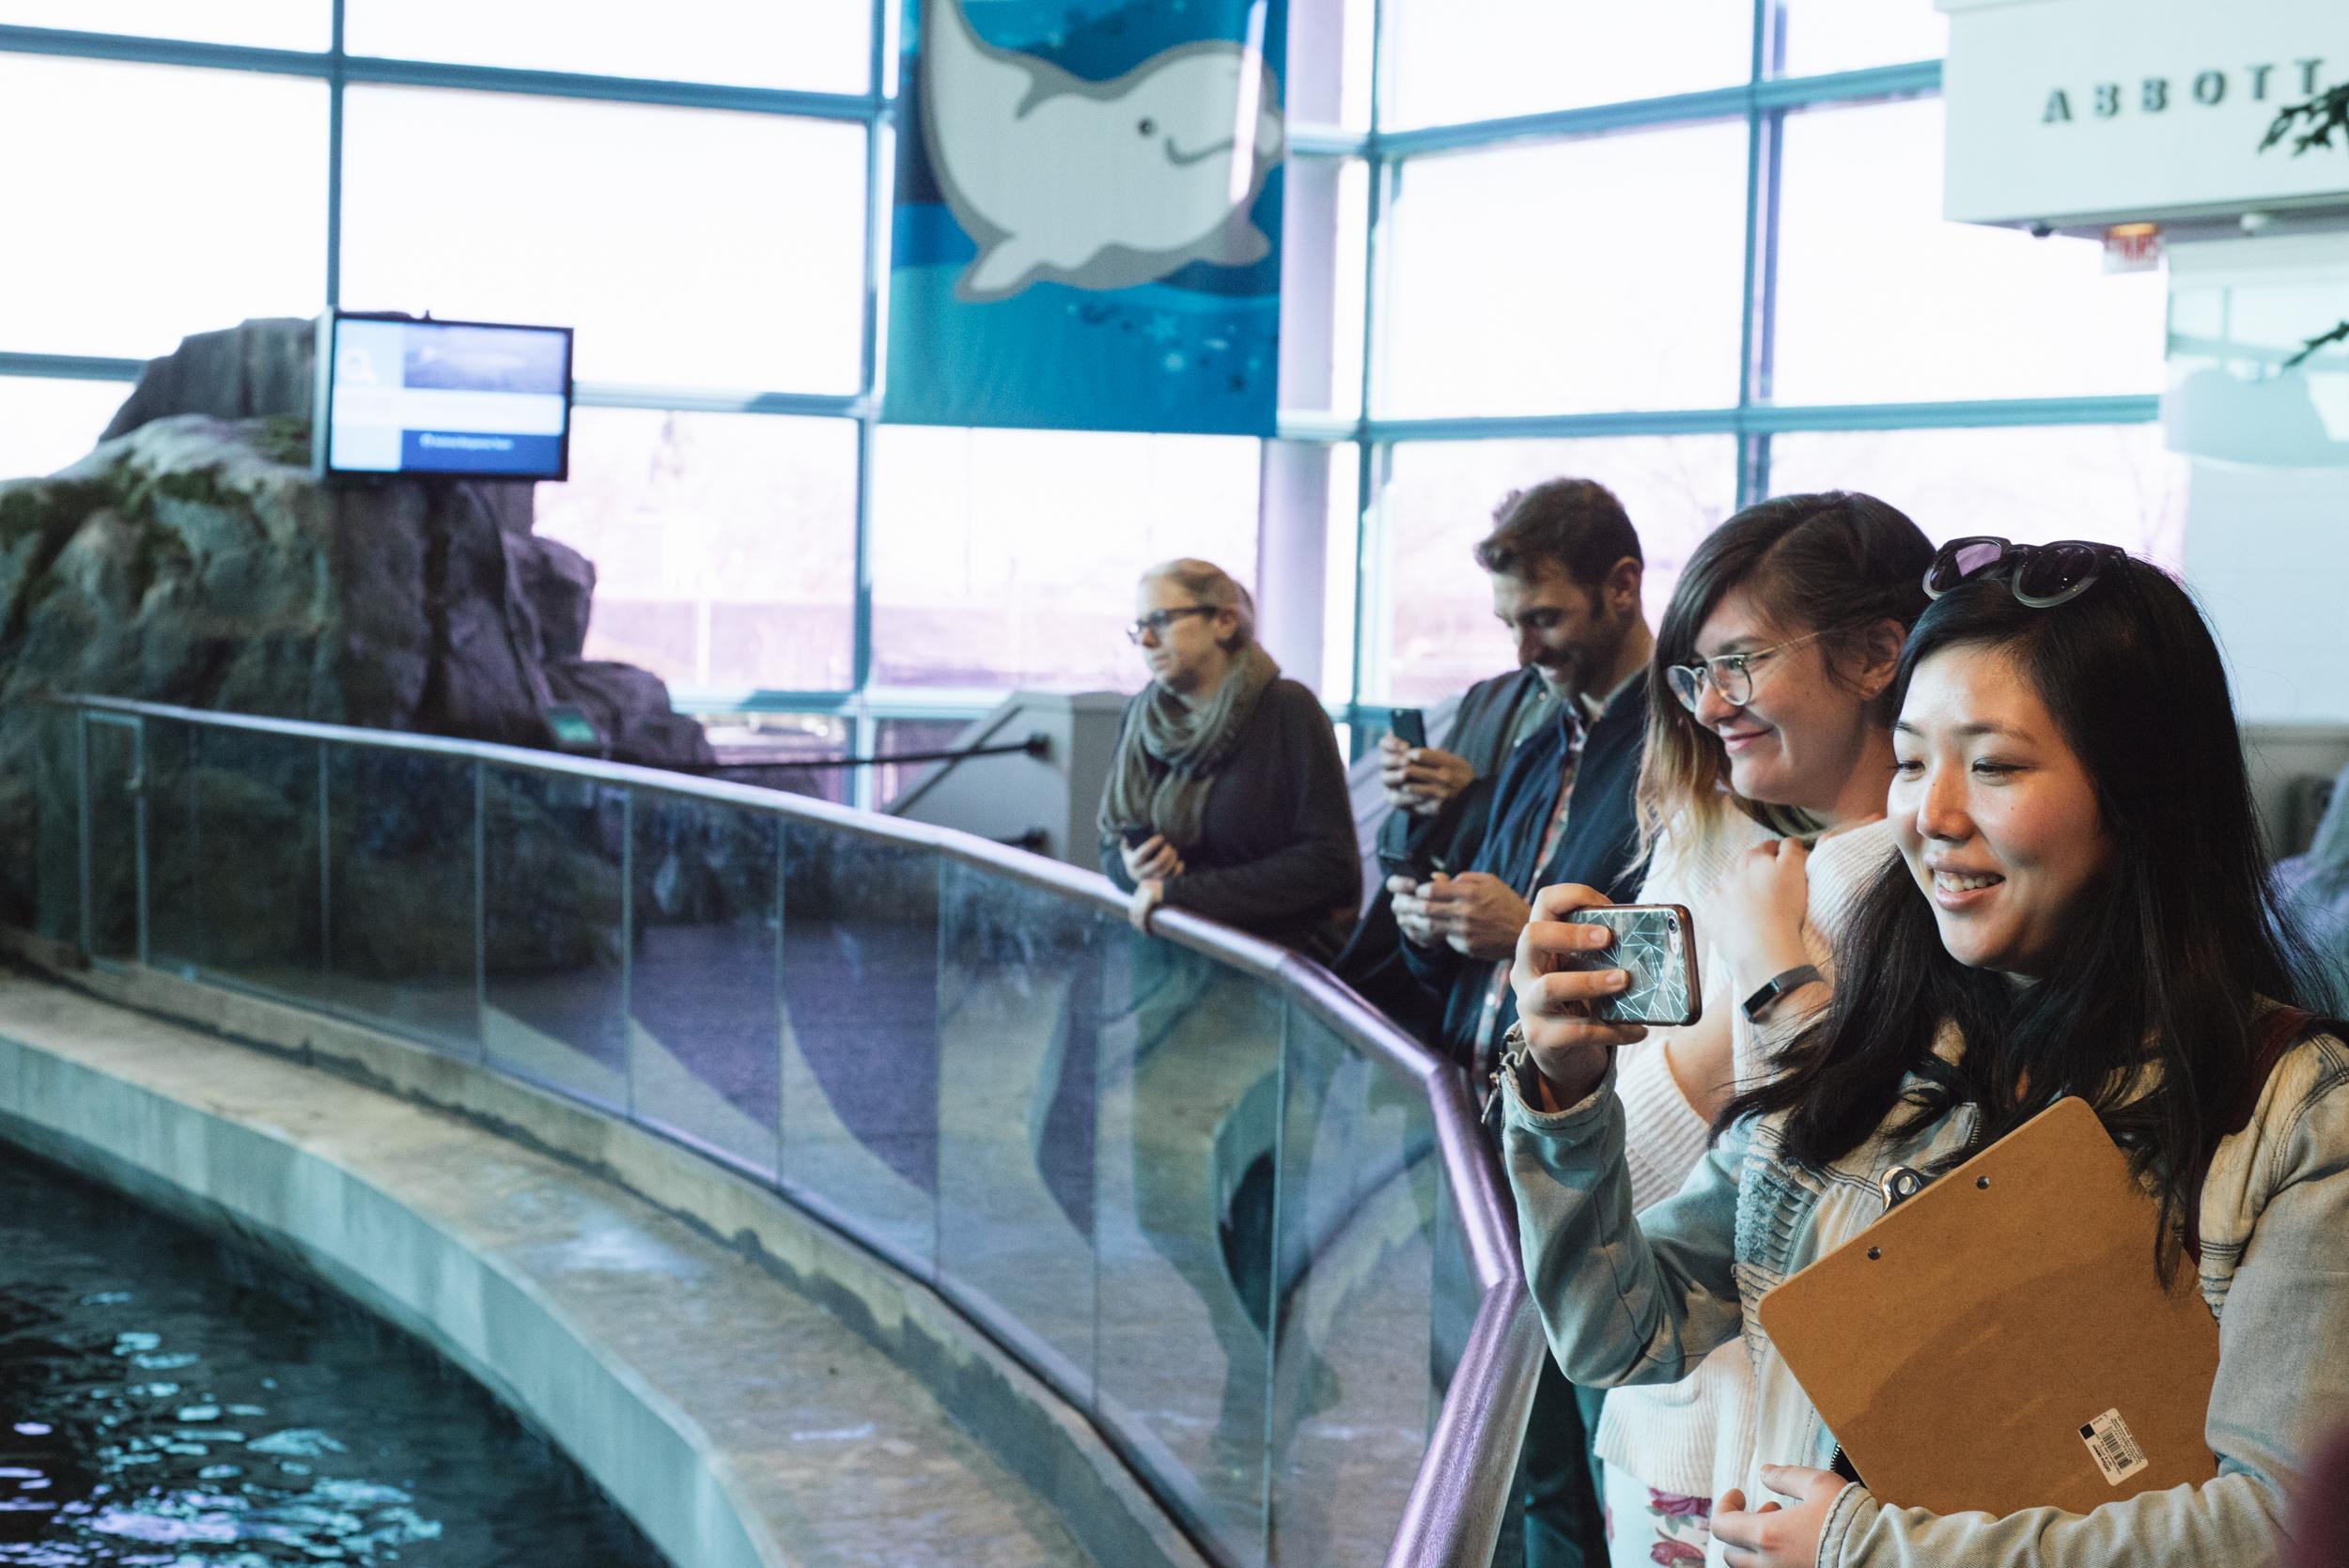 Shedd Aquarium Tour